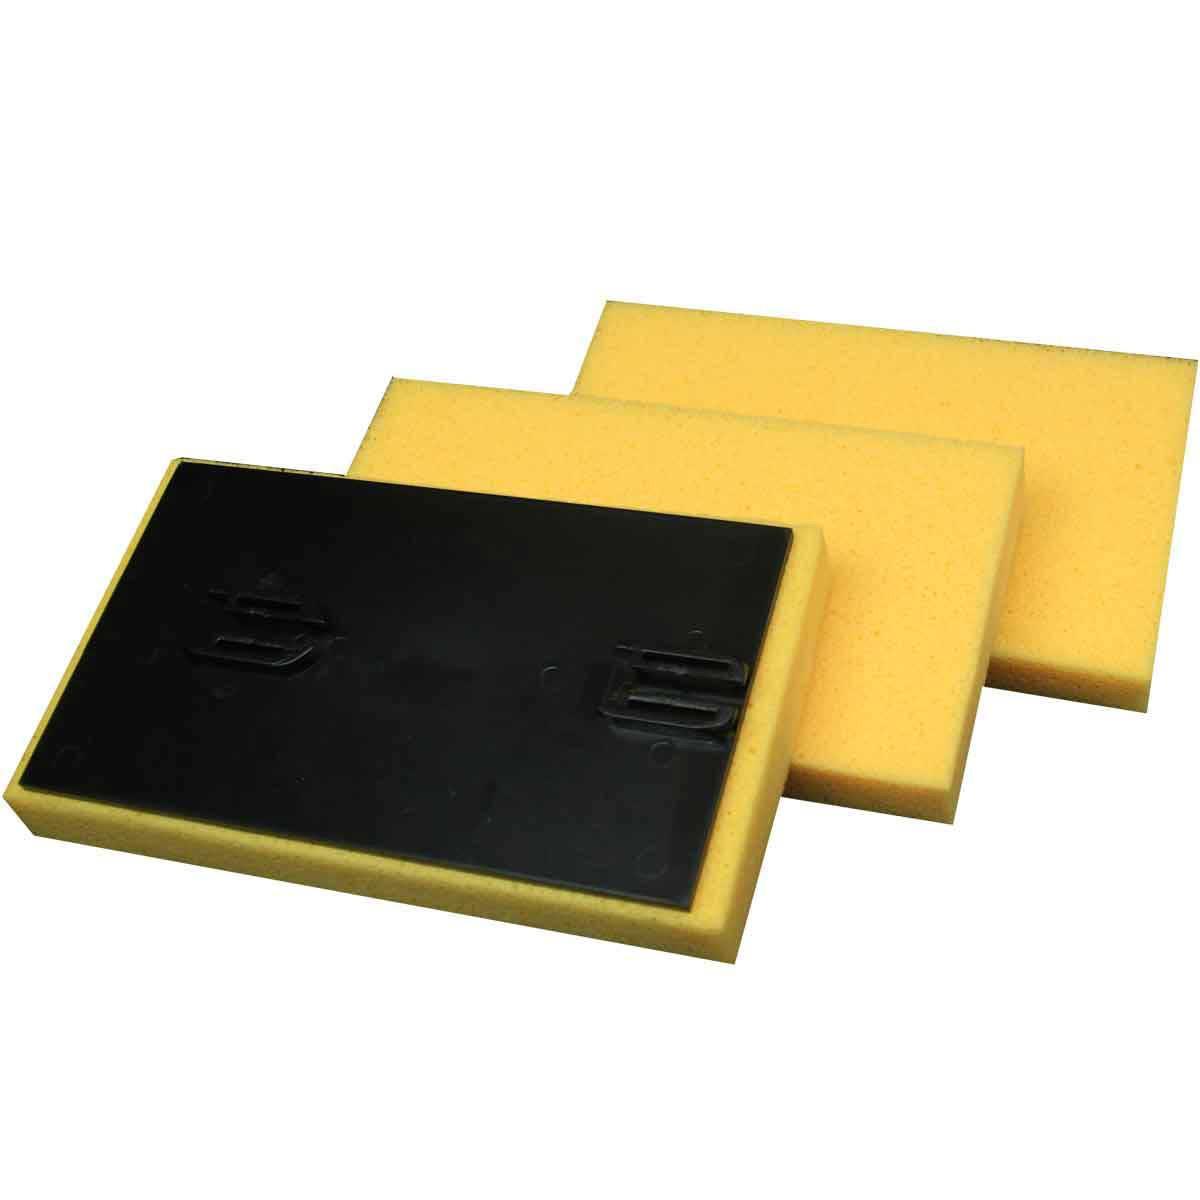 Image 6 wmrsb3 wringmaster repl sponge and backer 3 pack image 6